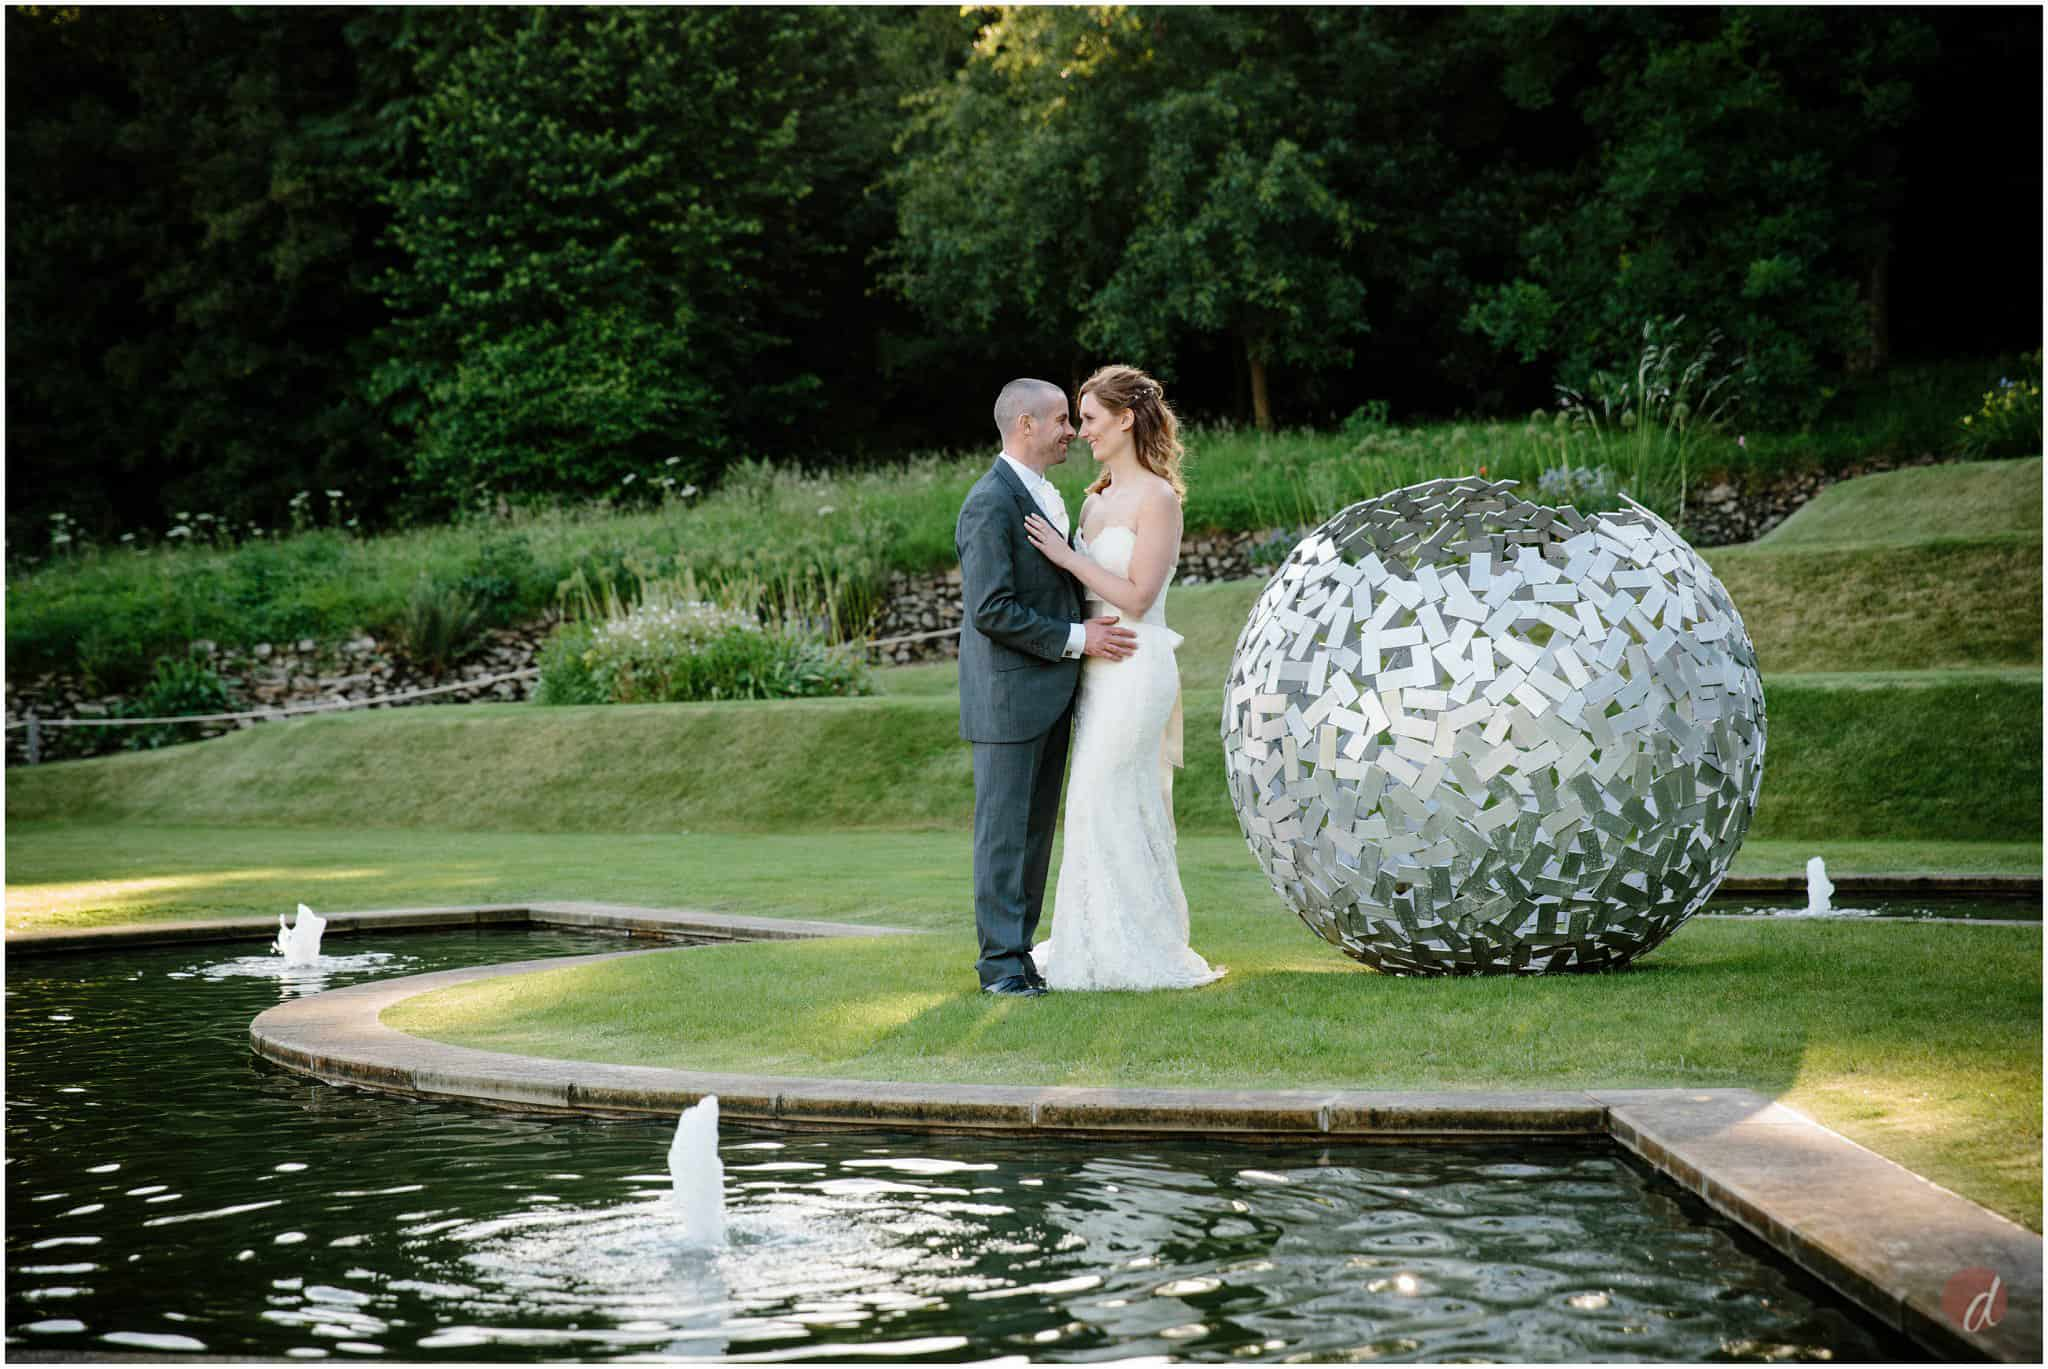 himalayan gardens wedding photography